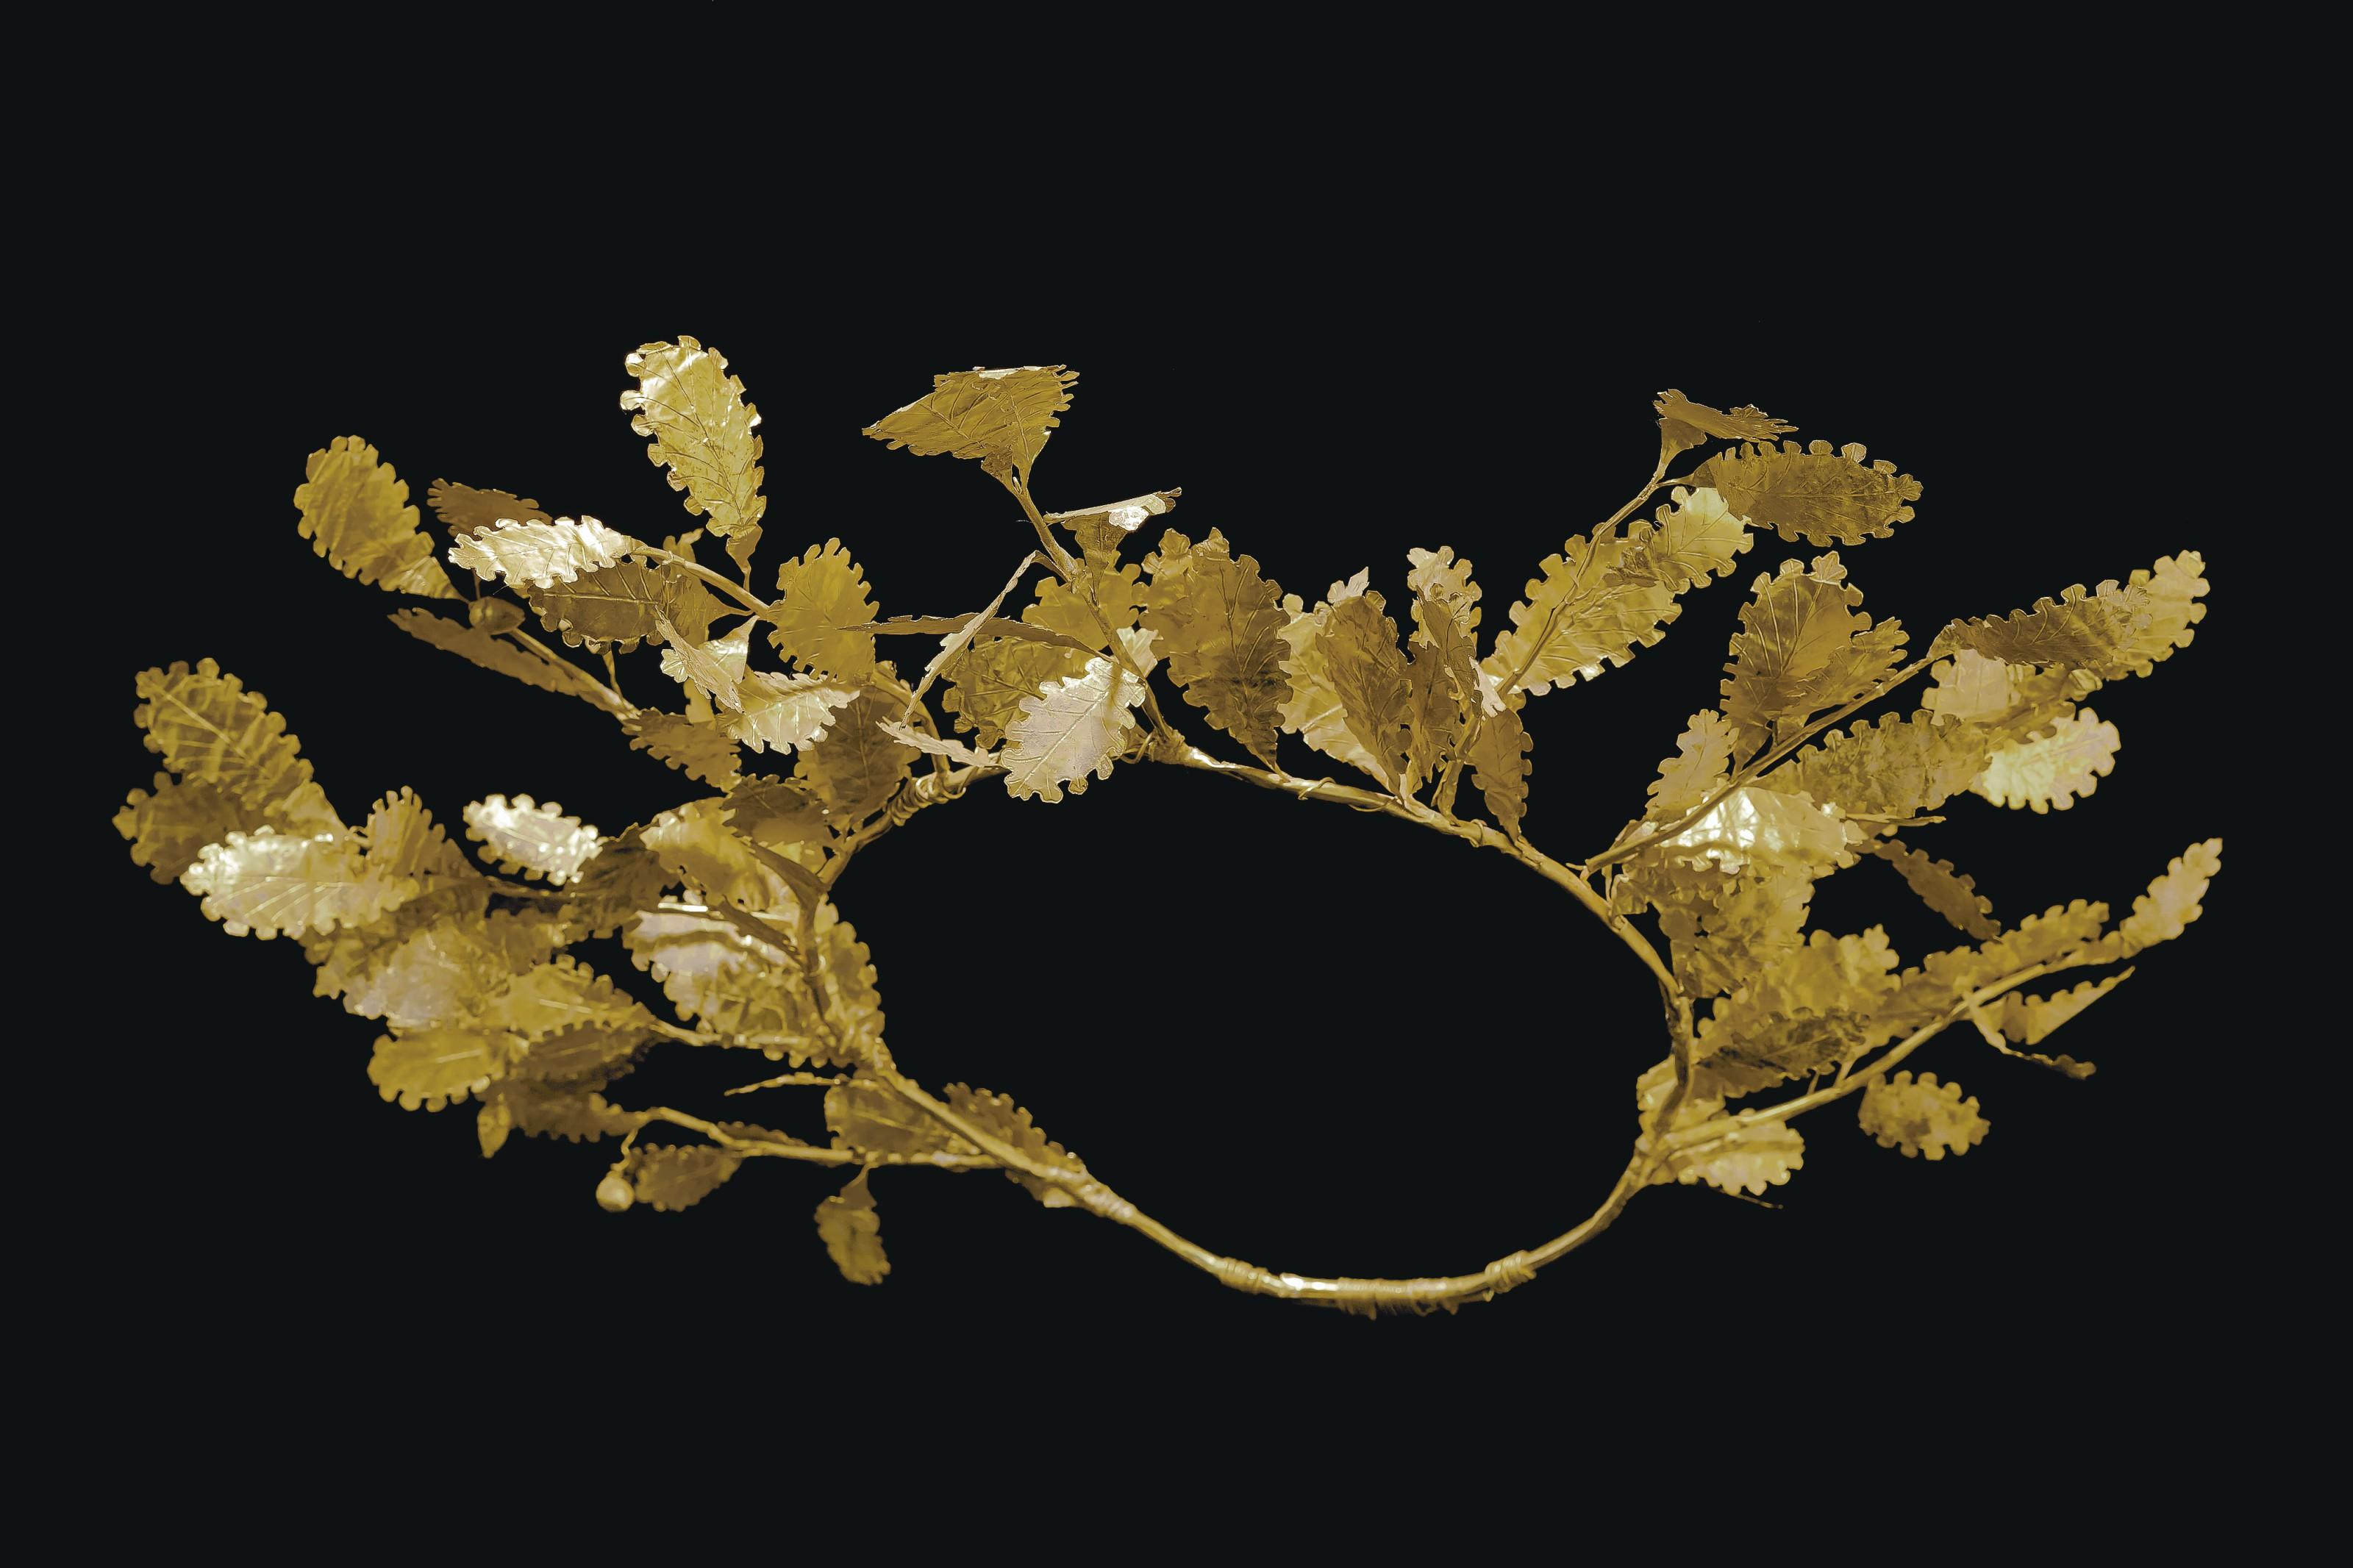 A GREEK GOLD OAK WREATH